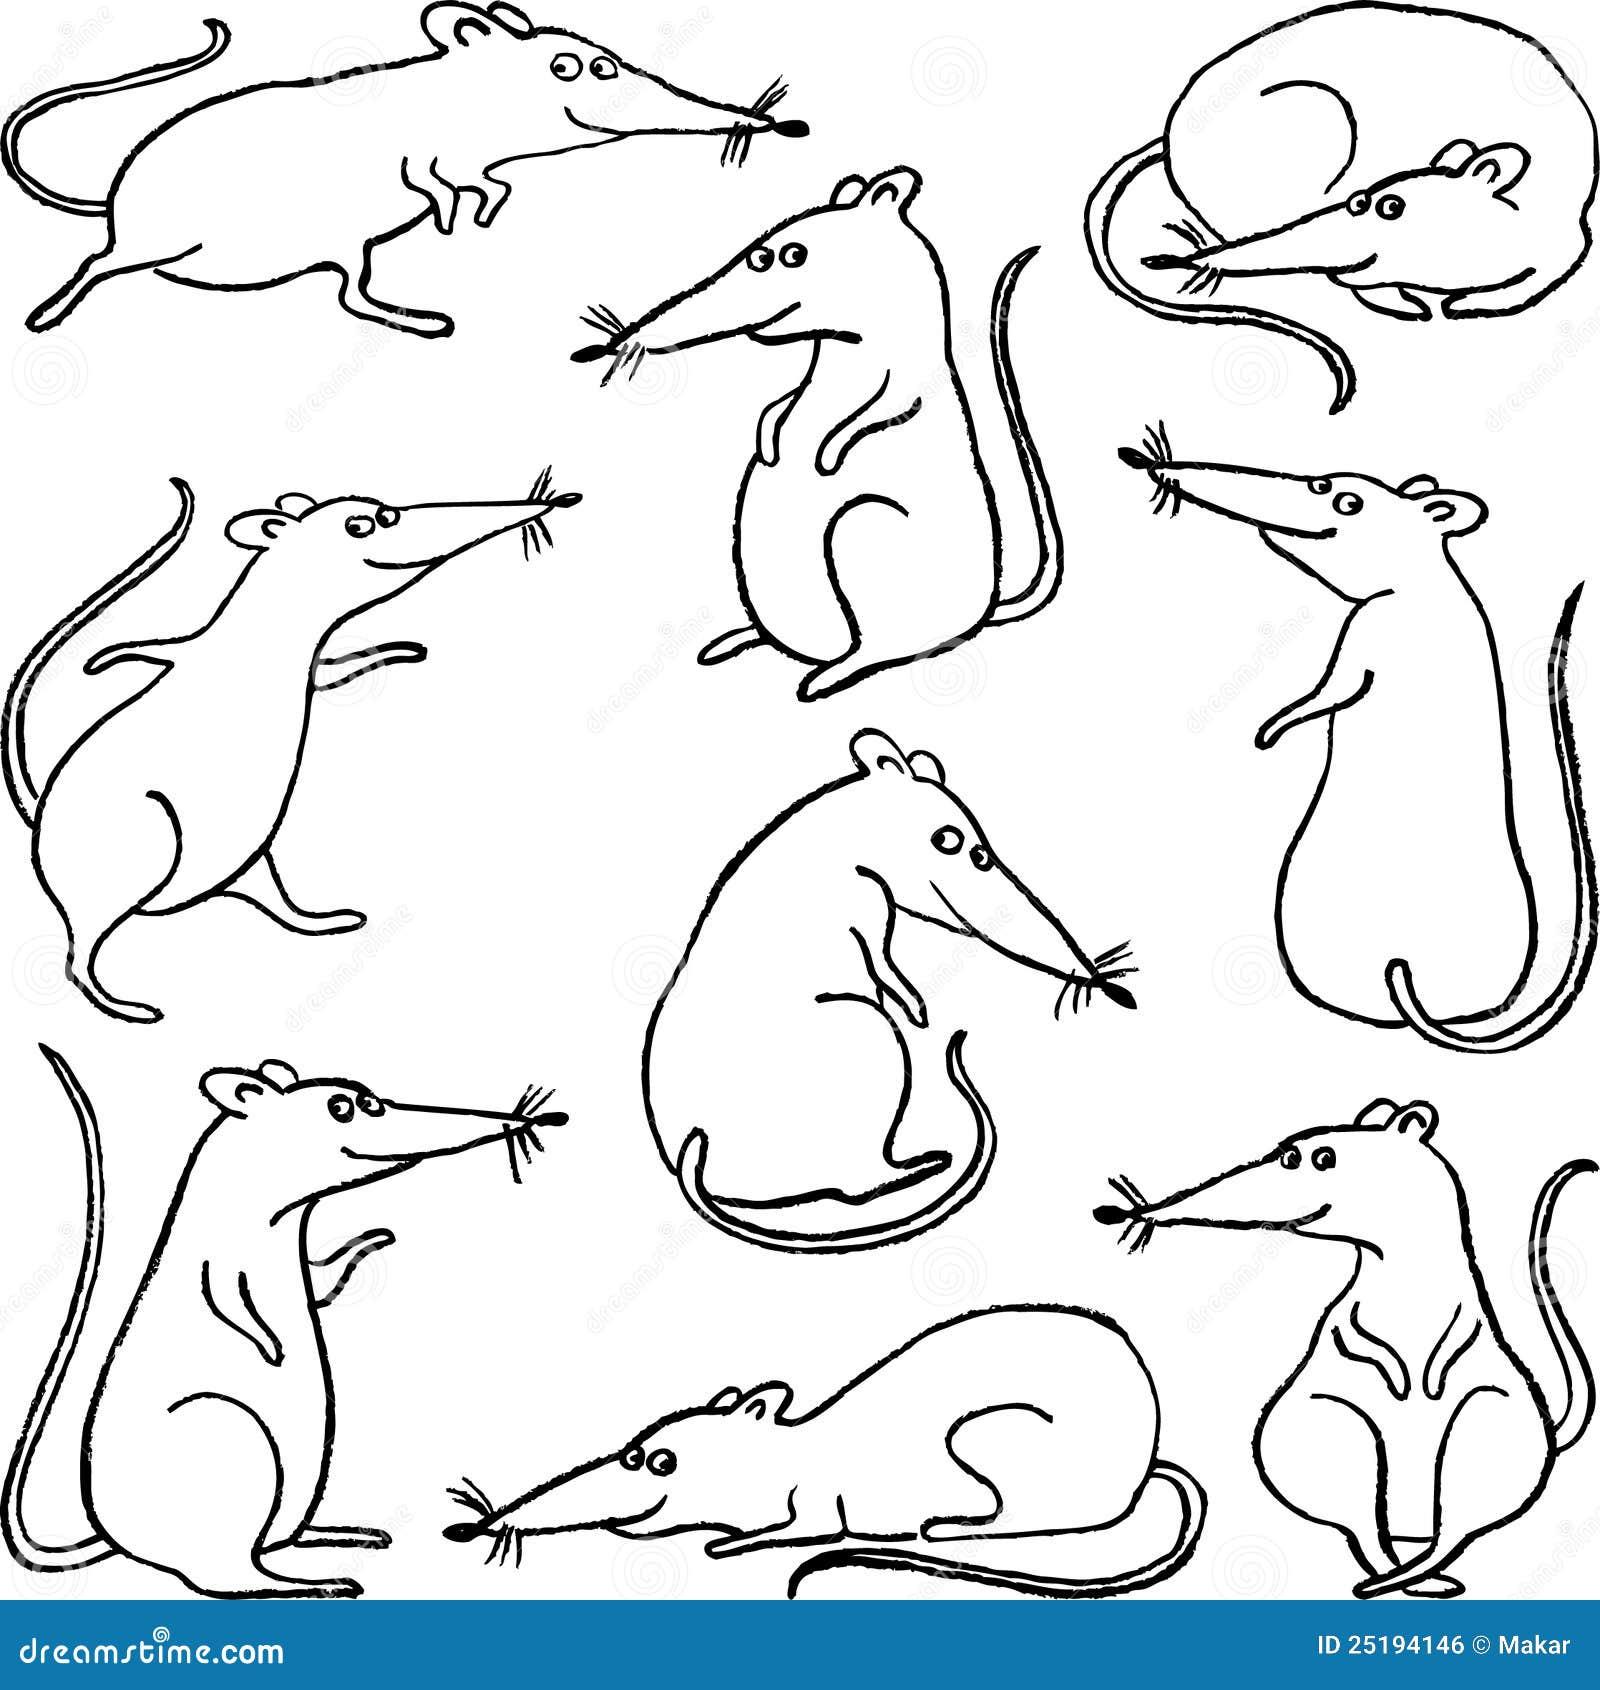 Line Drawing Rat : Cartoon rat stock vector illustration of vertebrate